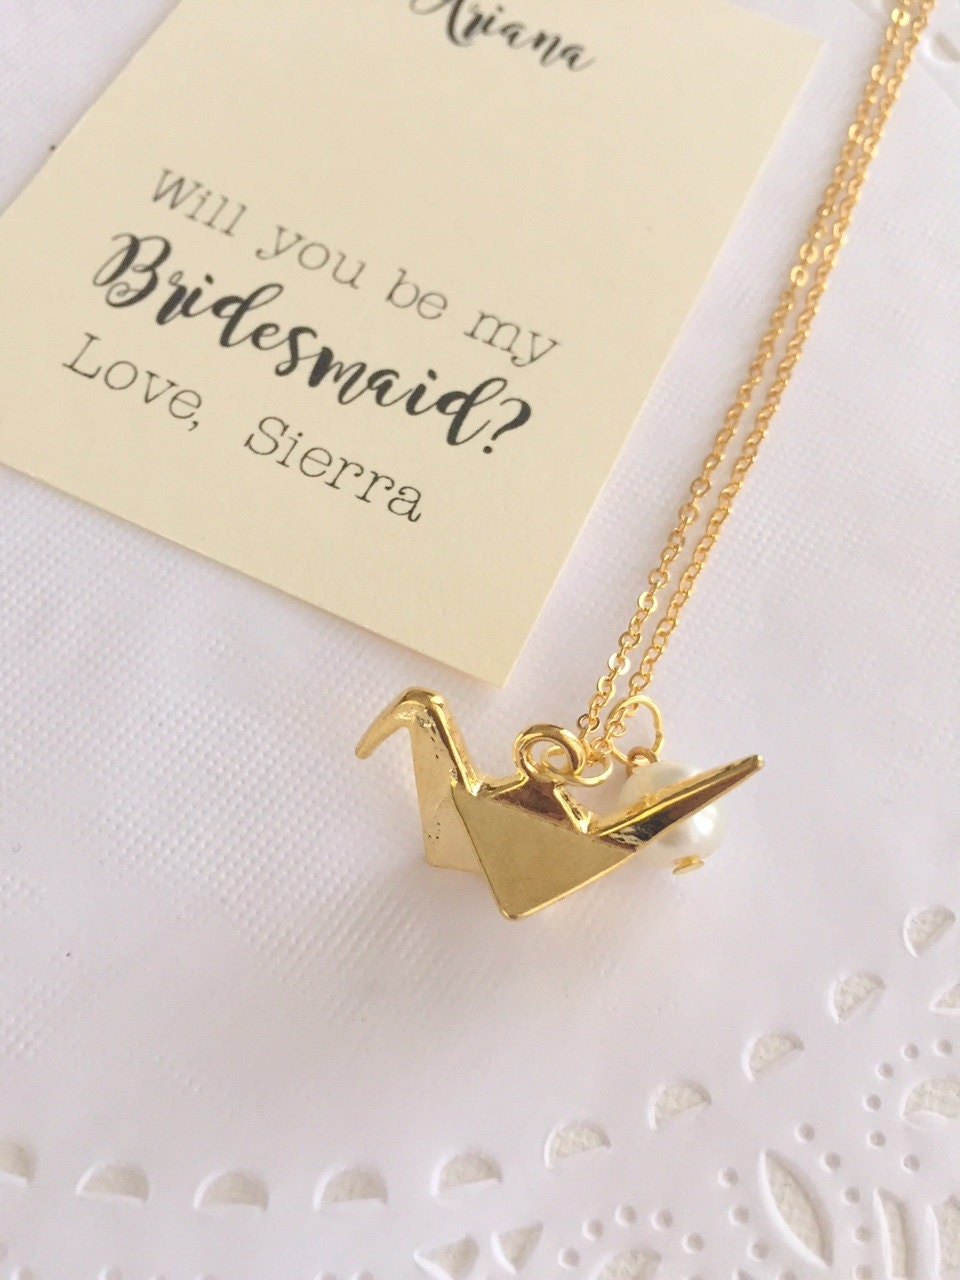 origami crane charm necklace ask bridesmaid gift bridesmaid